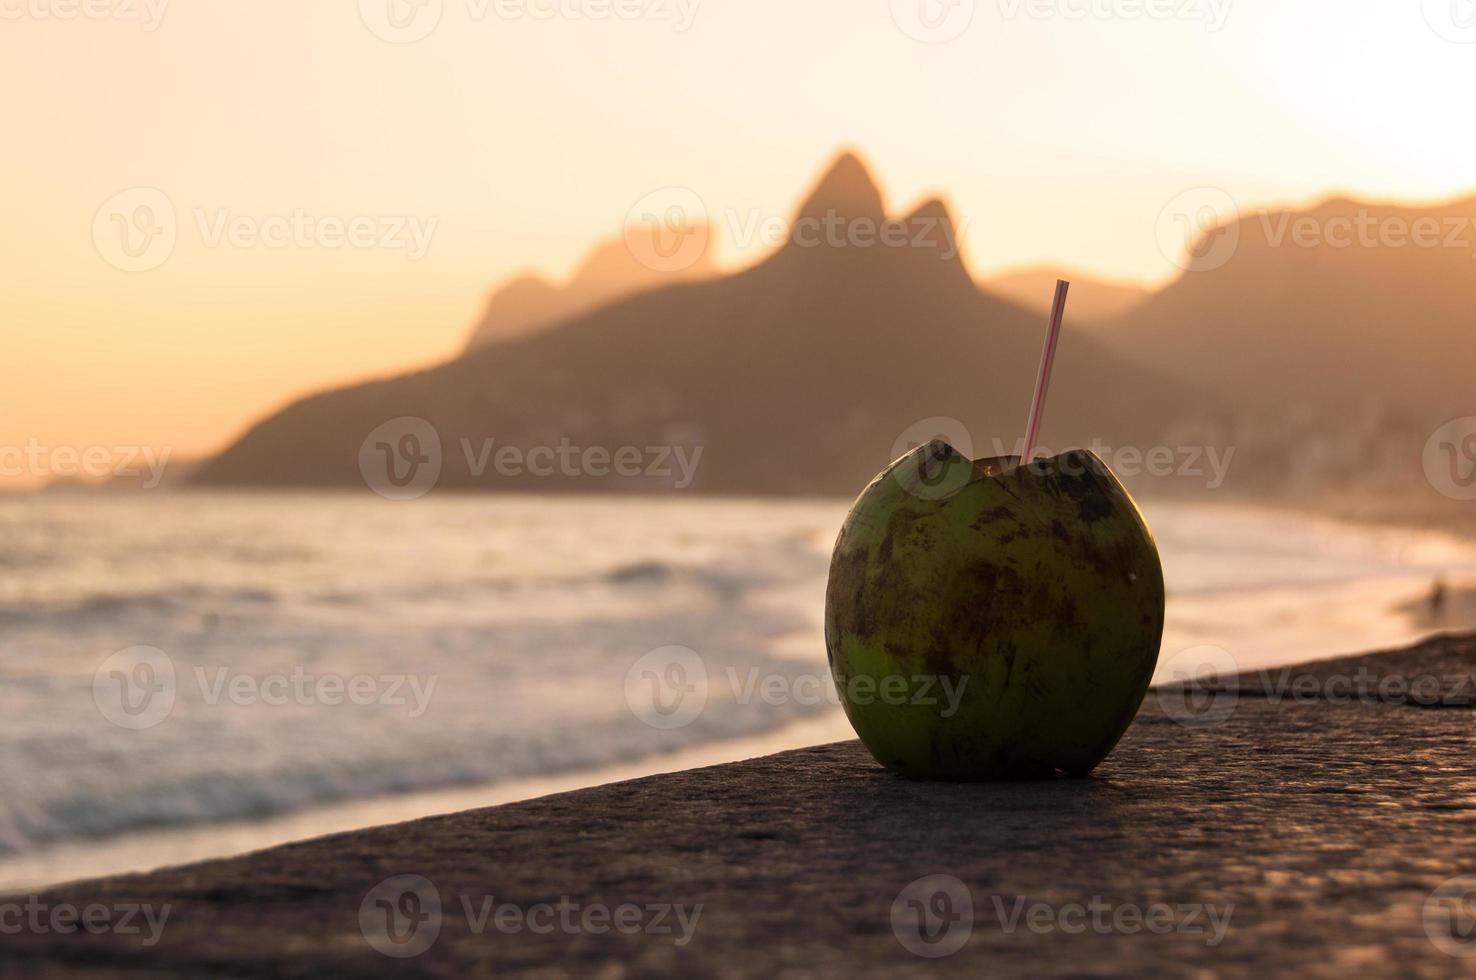 bebida de coco na praia de ipanema ao pôr do sol foto